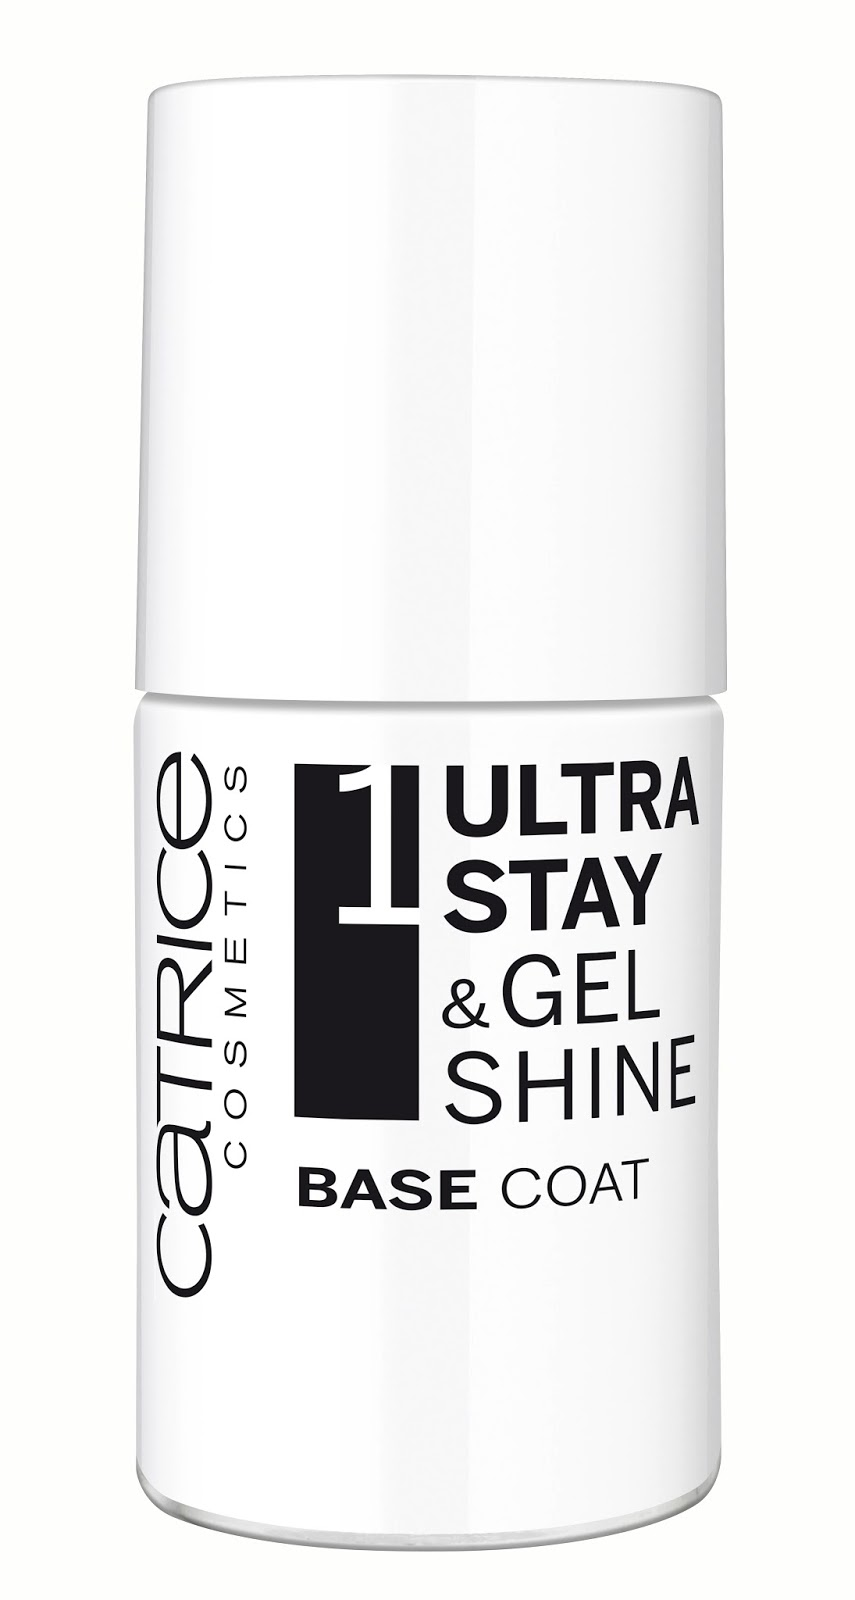 Catrice - Ultra Stay & Gel Shine Base Coat